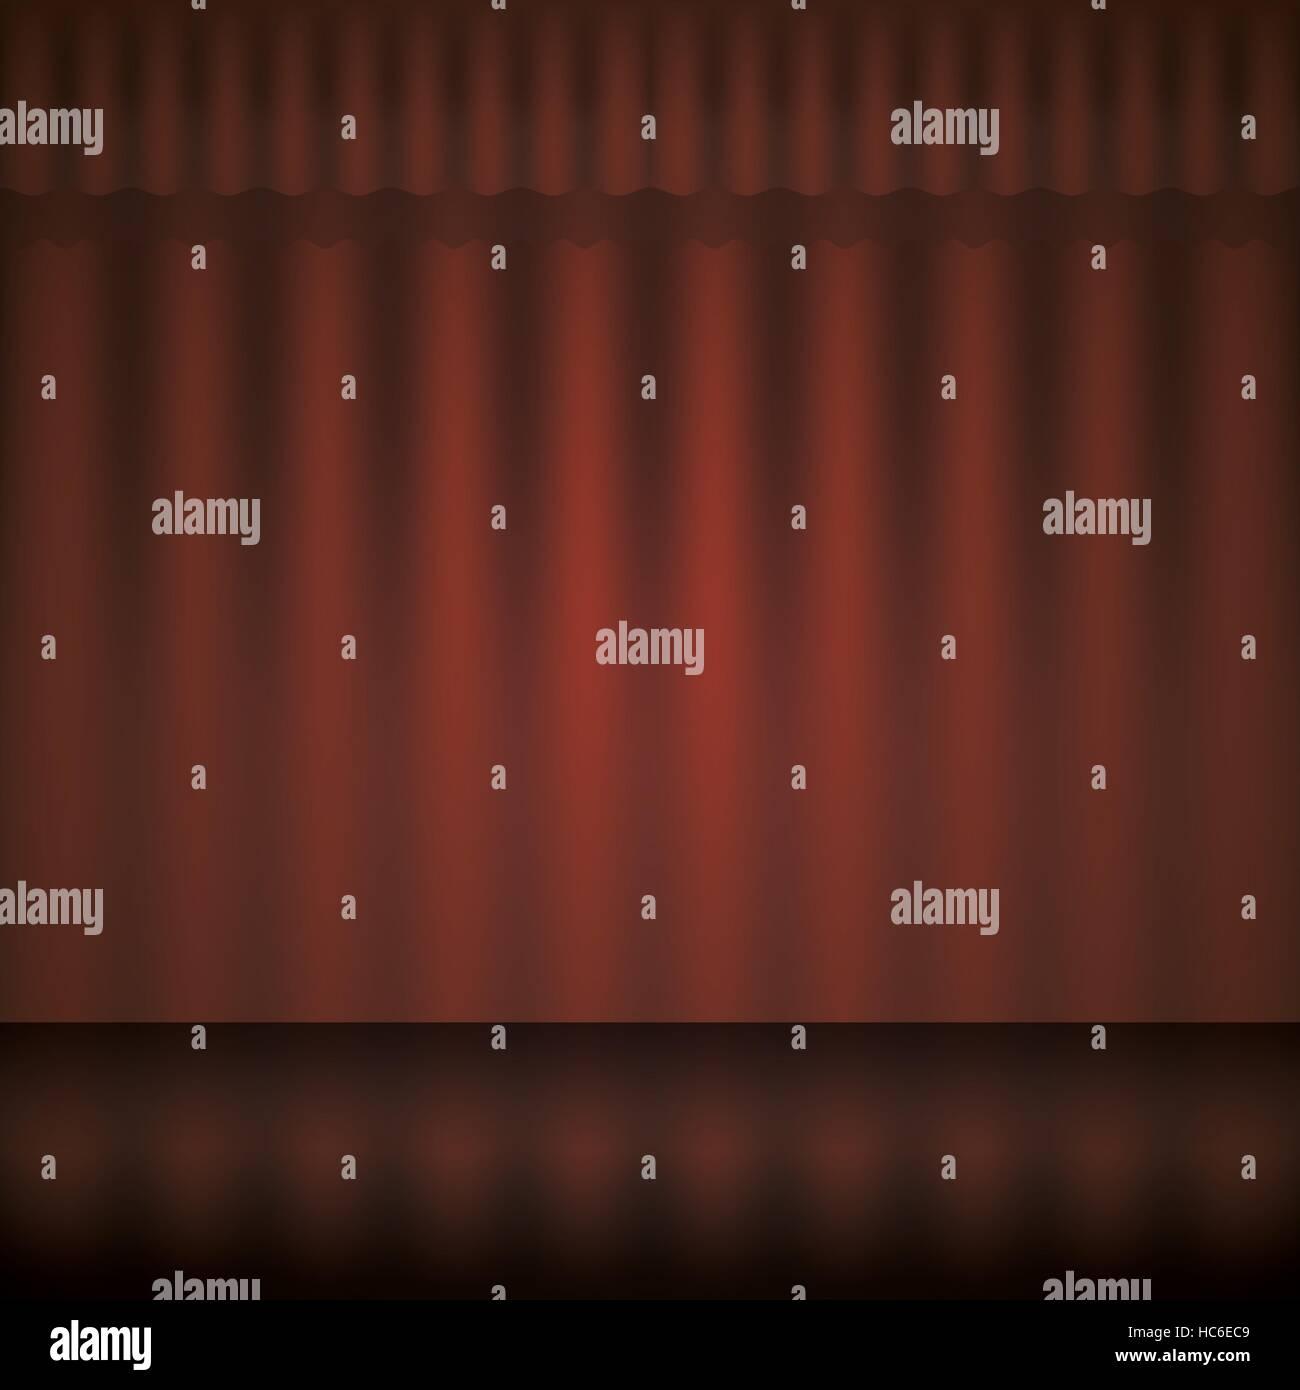 Blurred background design - Stock Vector